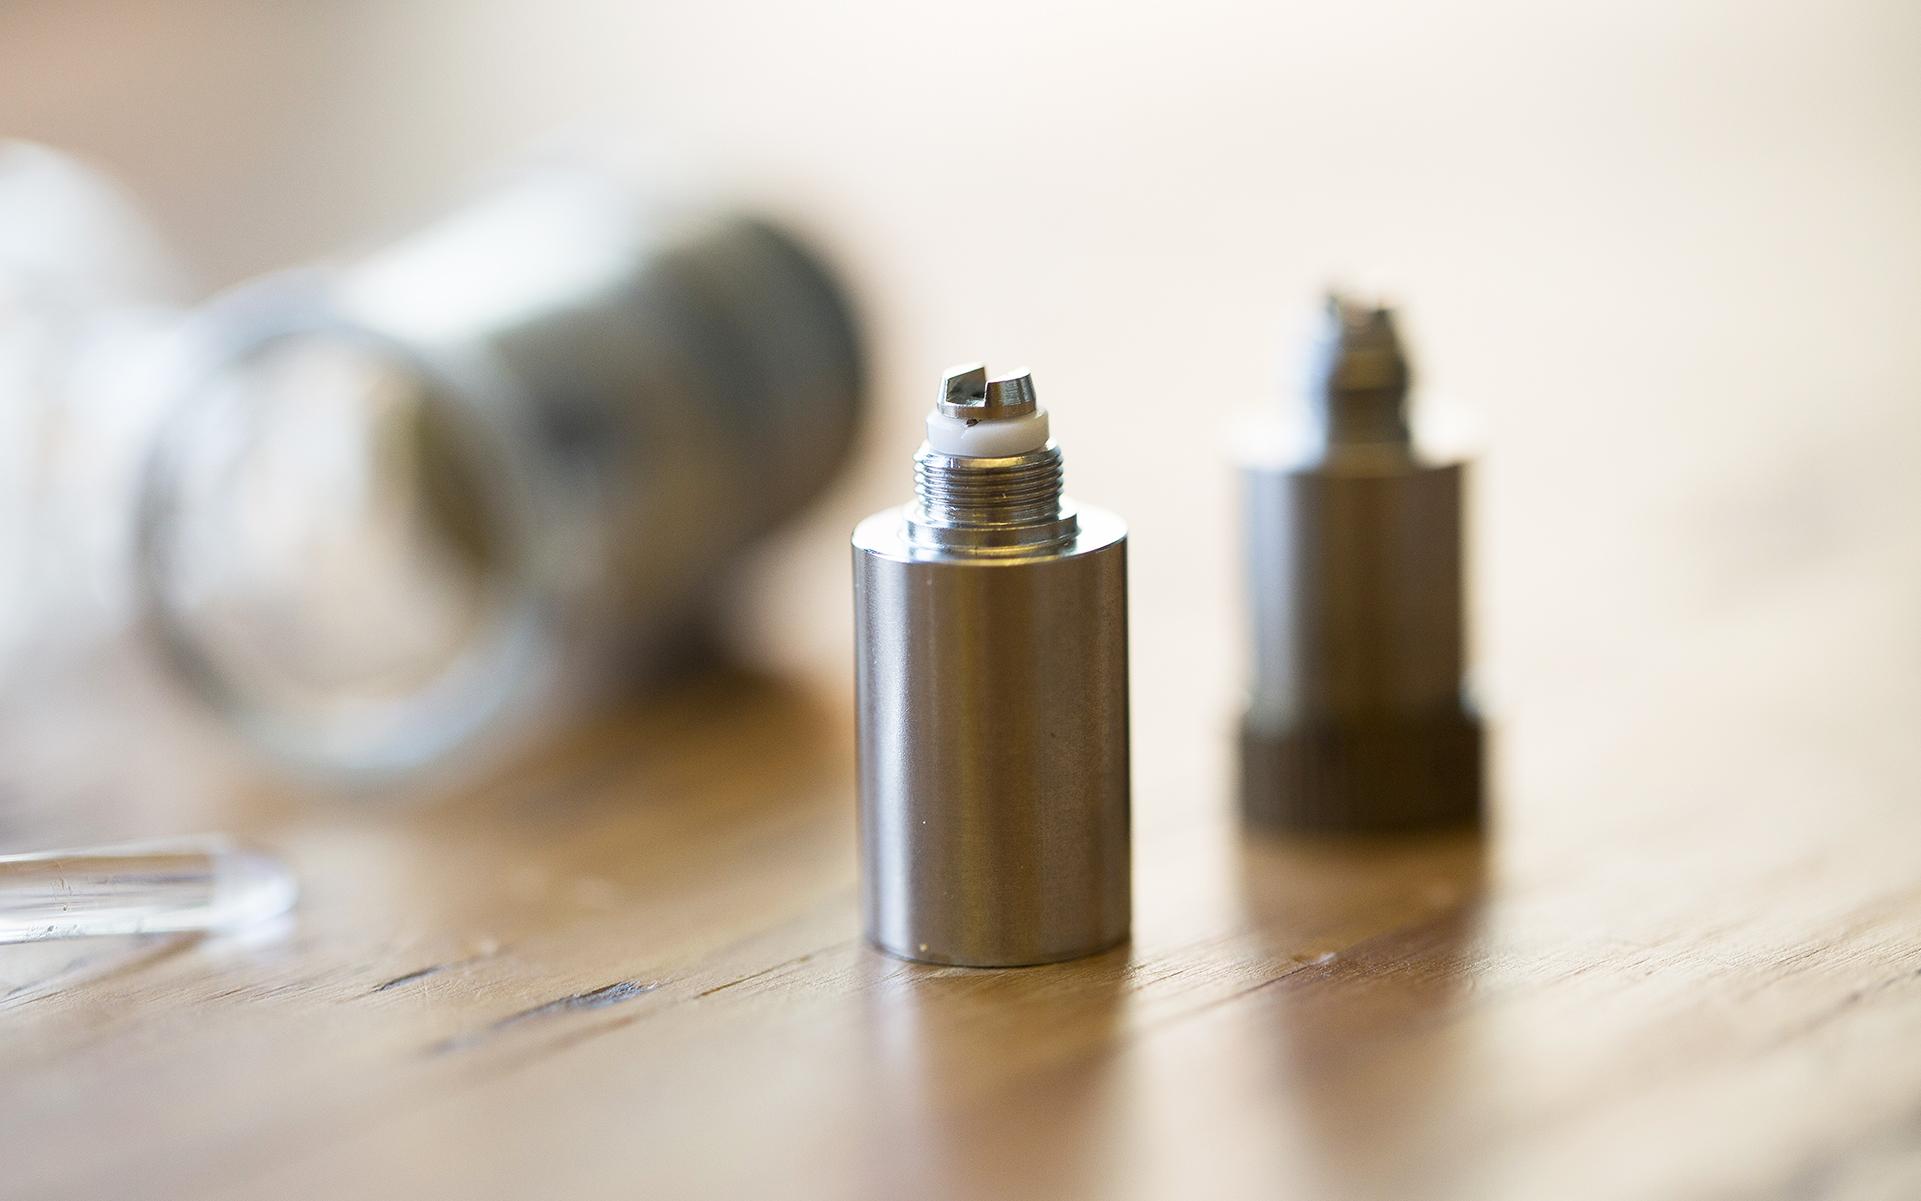 Product Review: SOURCE Nail Portable eNail & Vape Pen Temp Control eRig